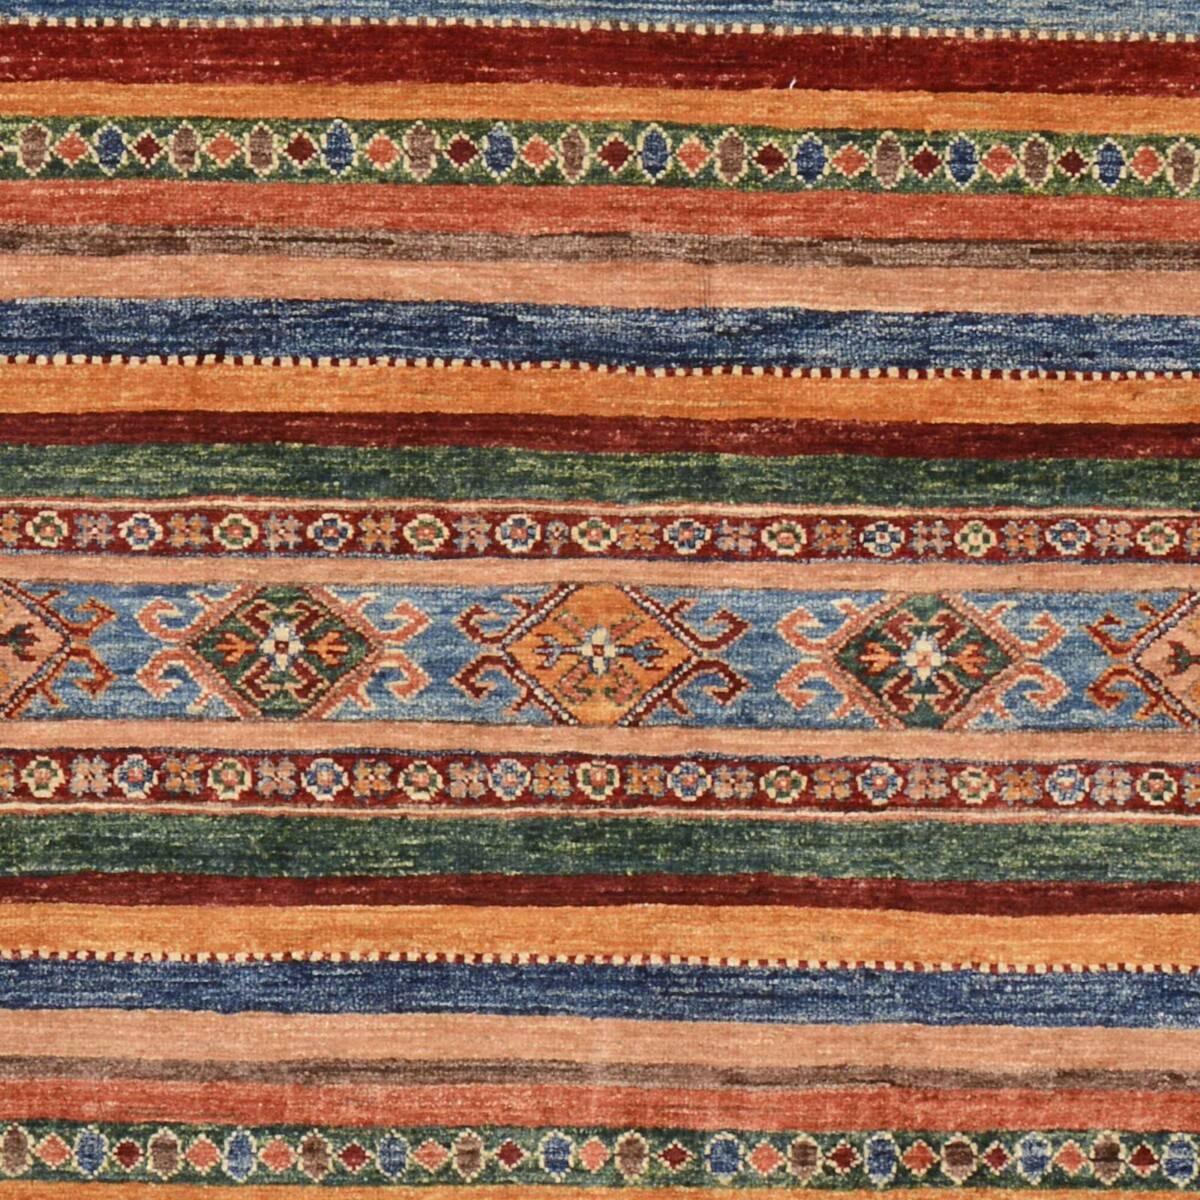 Dywan Wełniany Samarkand Mamlook 213 x 147 75687